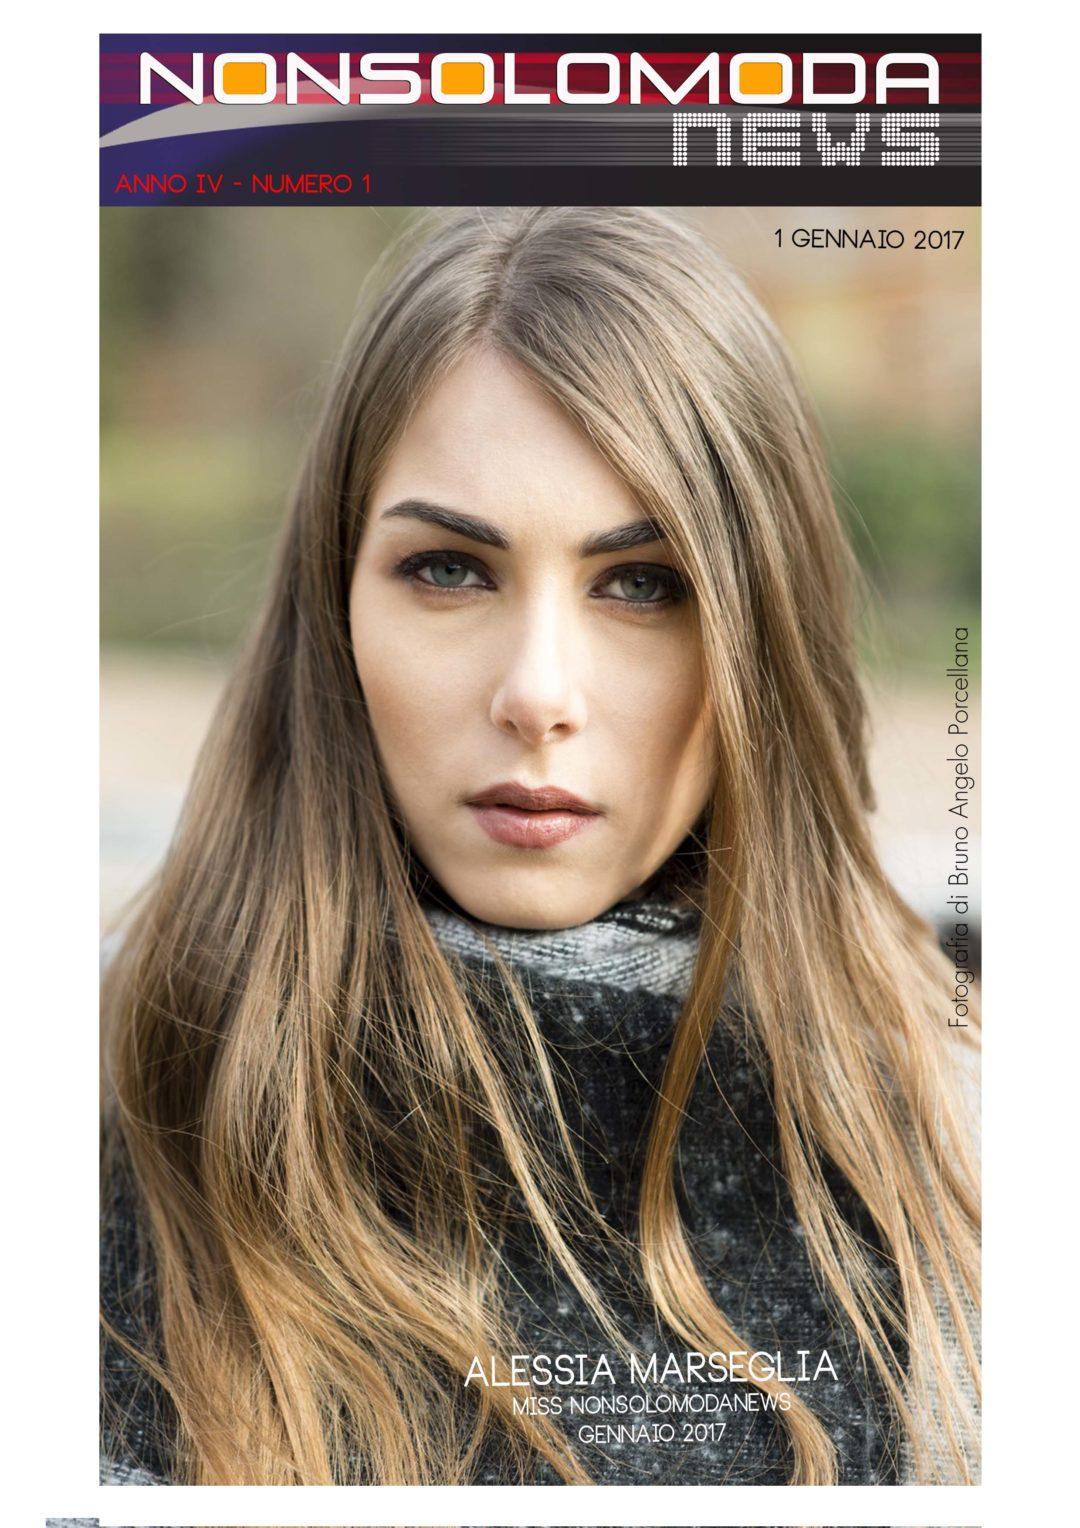 Alessia Marseglia - Miss Nonsolomodanews Gennaio 2017